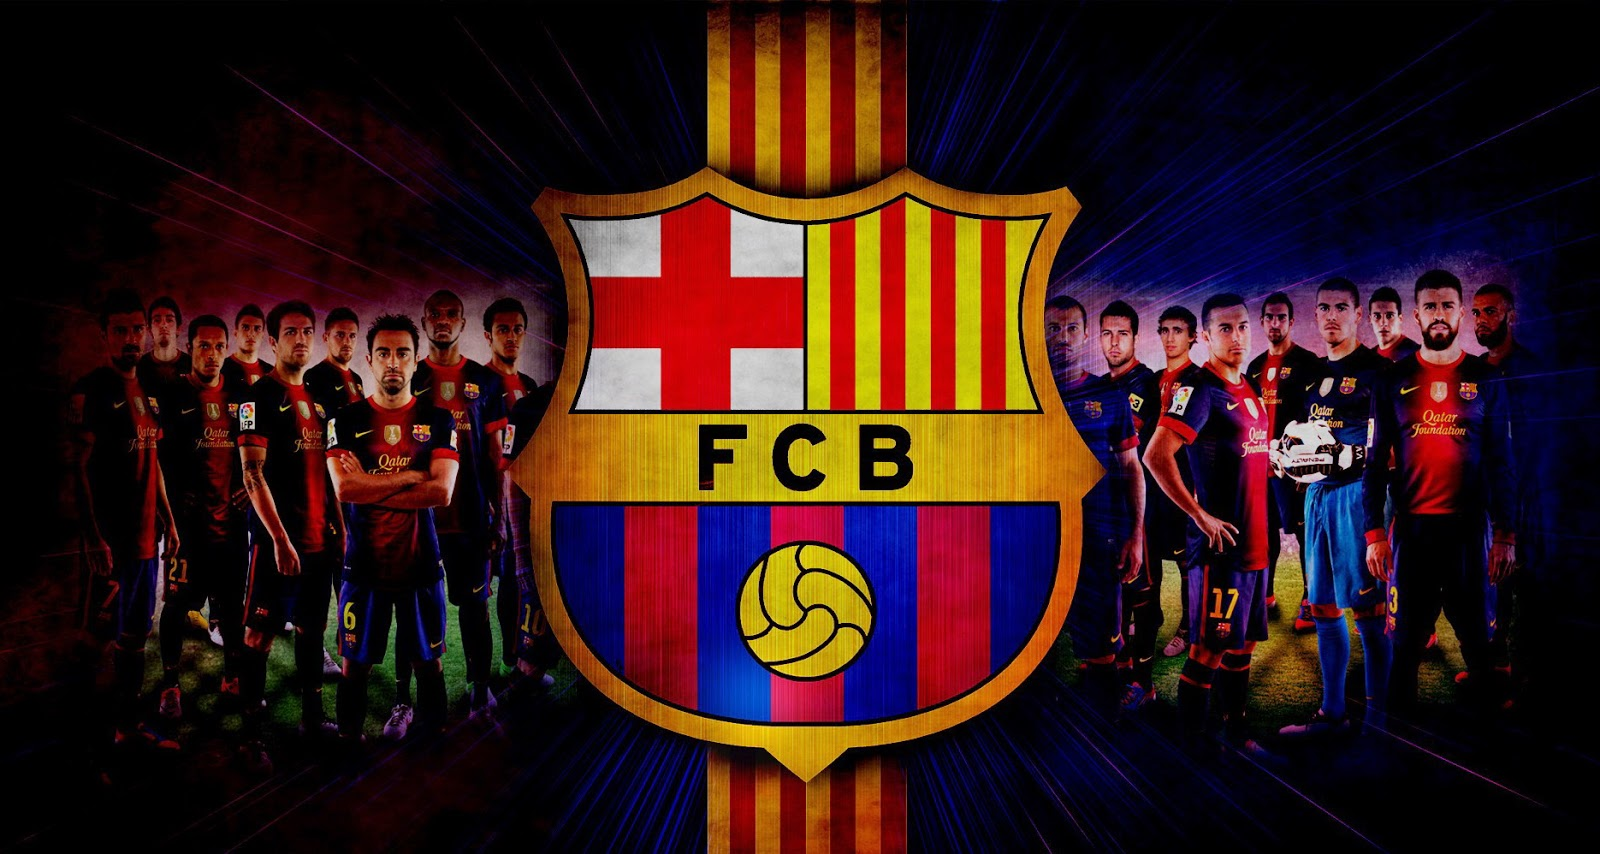 FC Barcelona Player Brand New HD Wallpaper 2014 World 1600x854